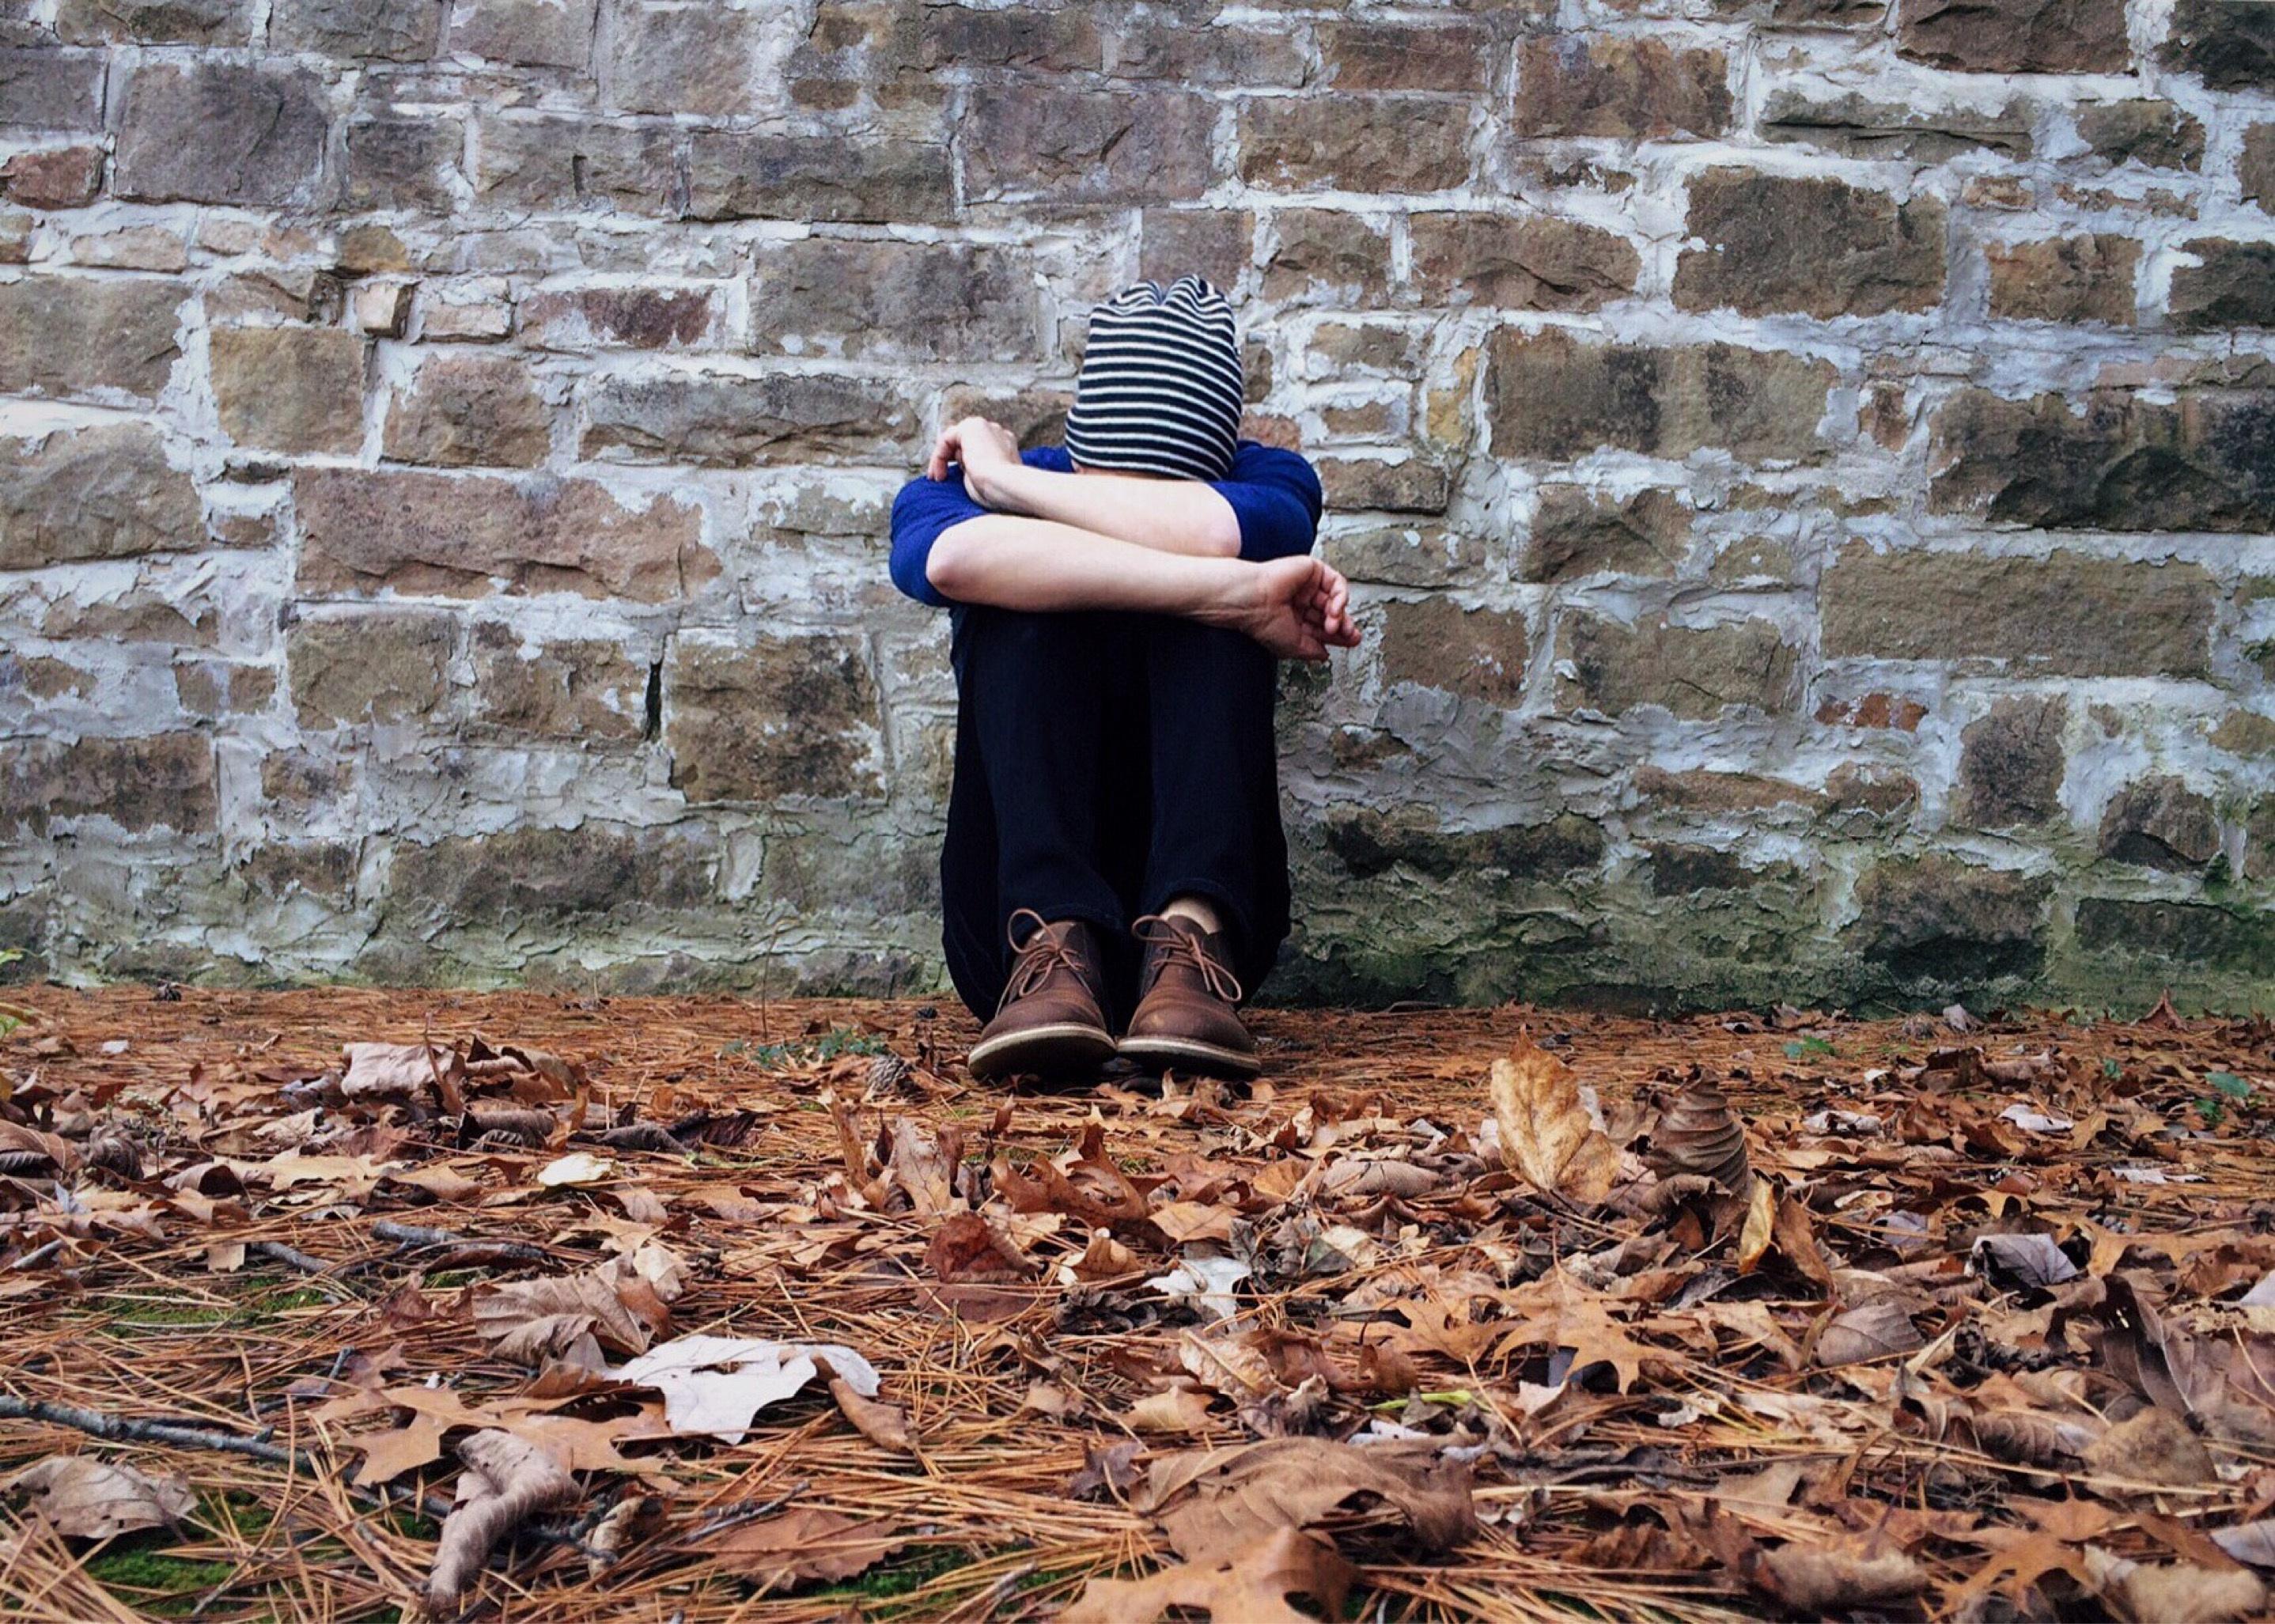 Boy Sitting on Ground Leaning Against Brickstone Wall